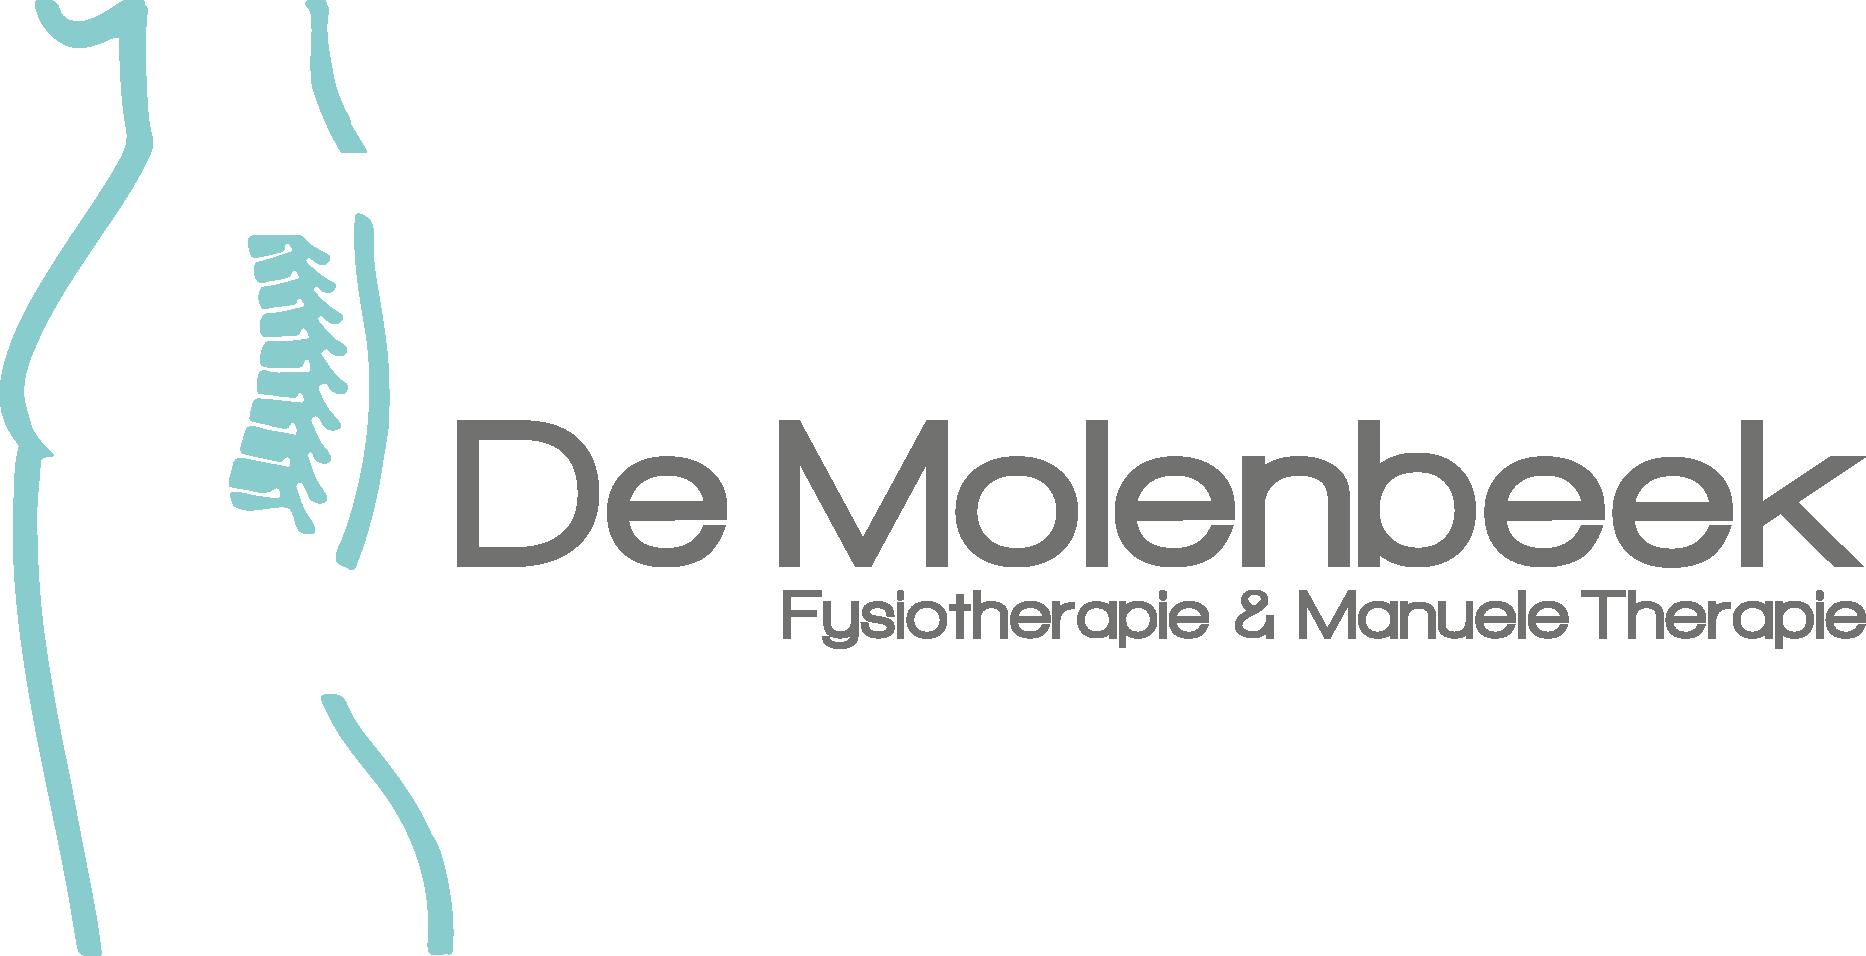 Fysiotherapie & Manuele Therapie De Molenbeek